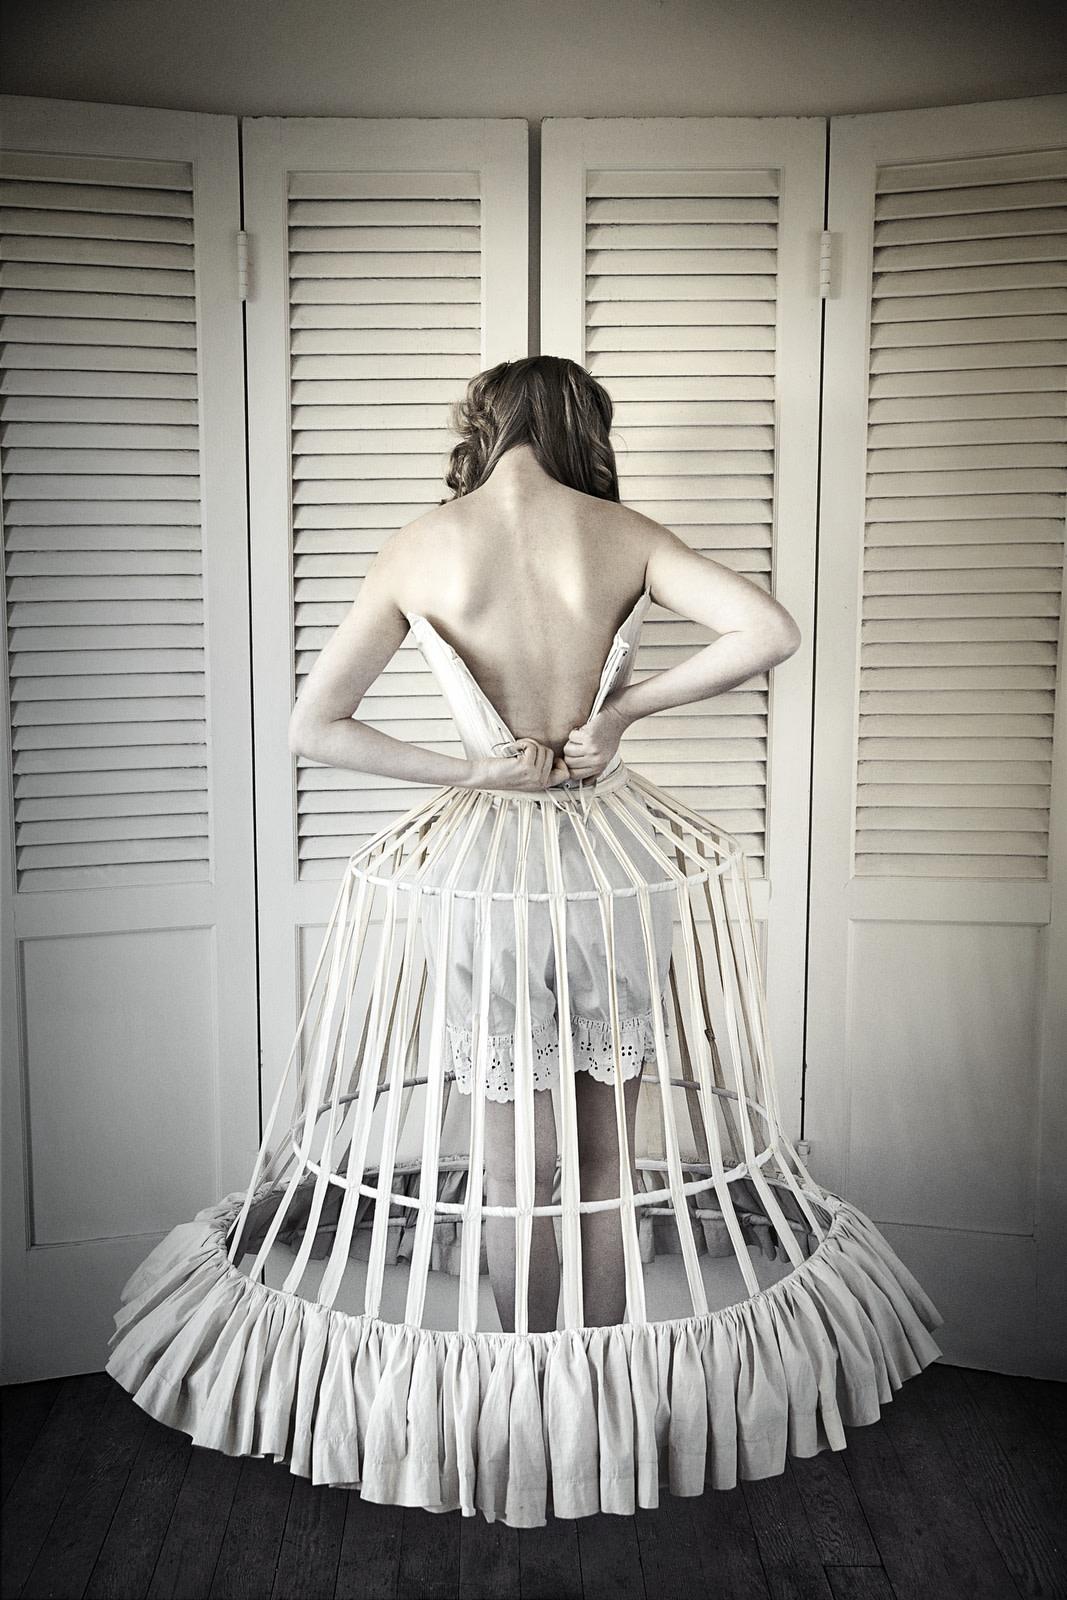 "<span class=""link fancybox-details-link""><a href=""/exhibitions/34/works/artworks452/"">View Detail Page</a></span><div class=""artist""><strong>Elisabeth Caren</strong></div><div class=""title""><em>Cage Crinoline</em>, 2013</div><div class=""medium"">C-Print, decked and floating in a white wood frame</div><div class=""dimensions"">74.6 x 57.1 cm<br>29 3/8 x 22 1/2 in.</div><div class=""edition_details"">Edition of 6</div>"